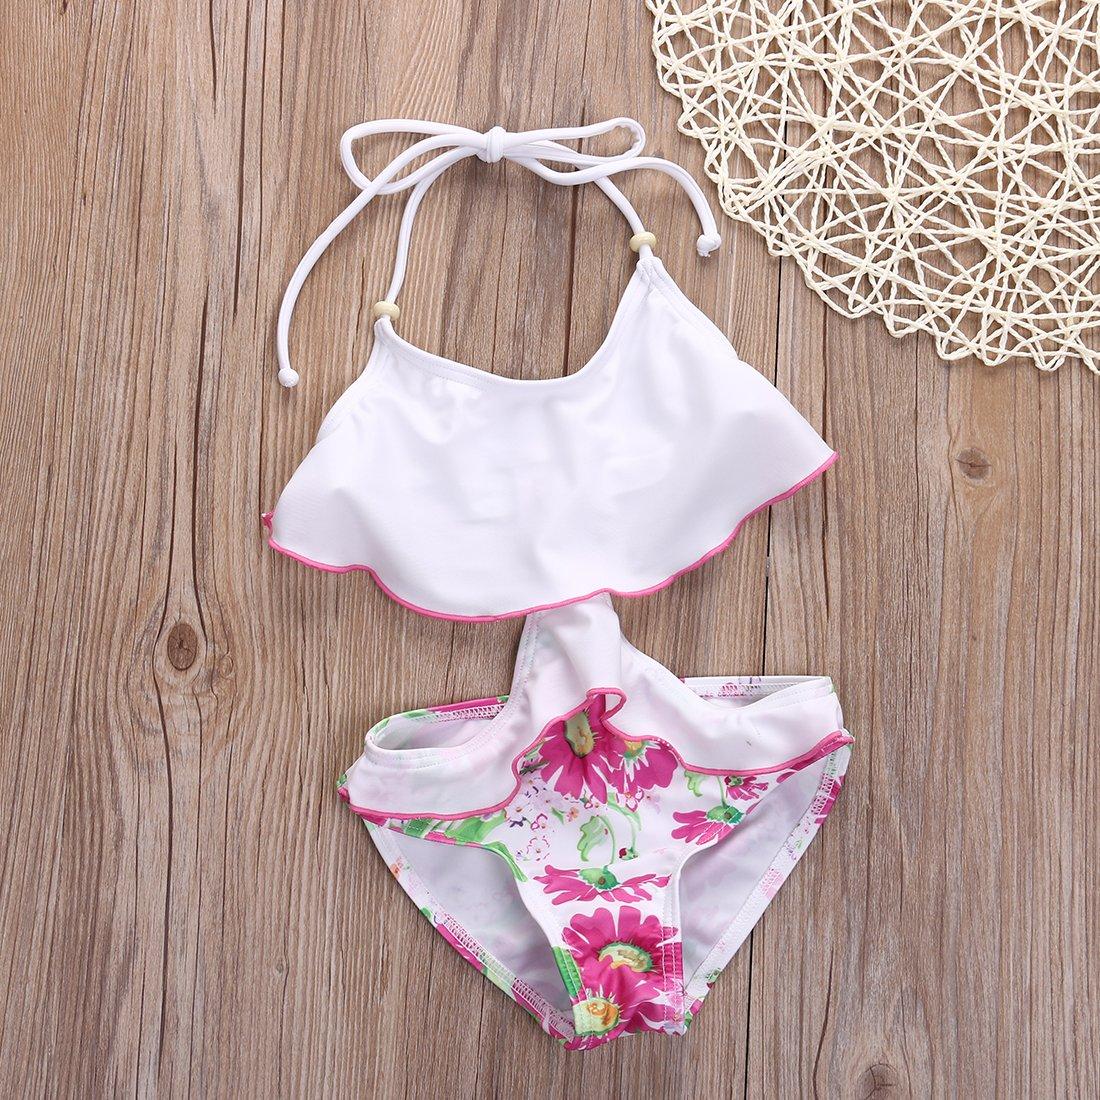 Little Girls One-piece Ruffle Flower Print Backless Monokini Swimsuit